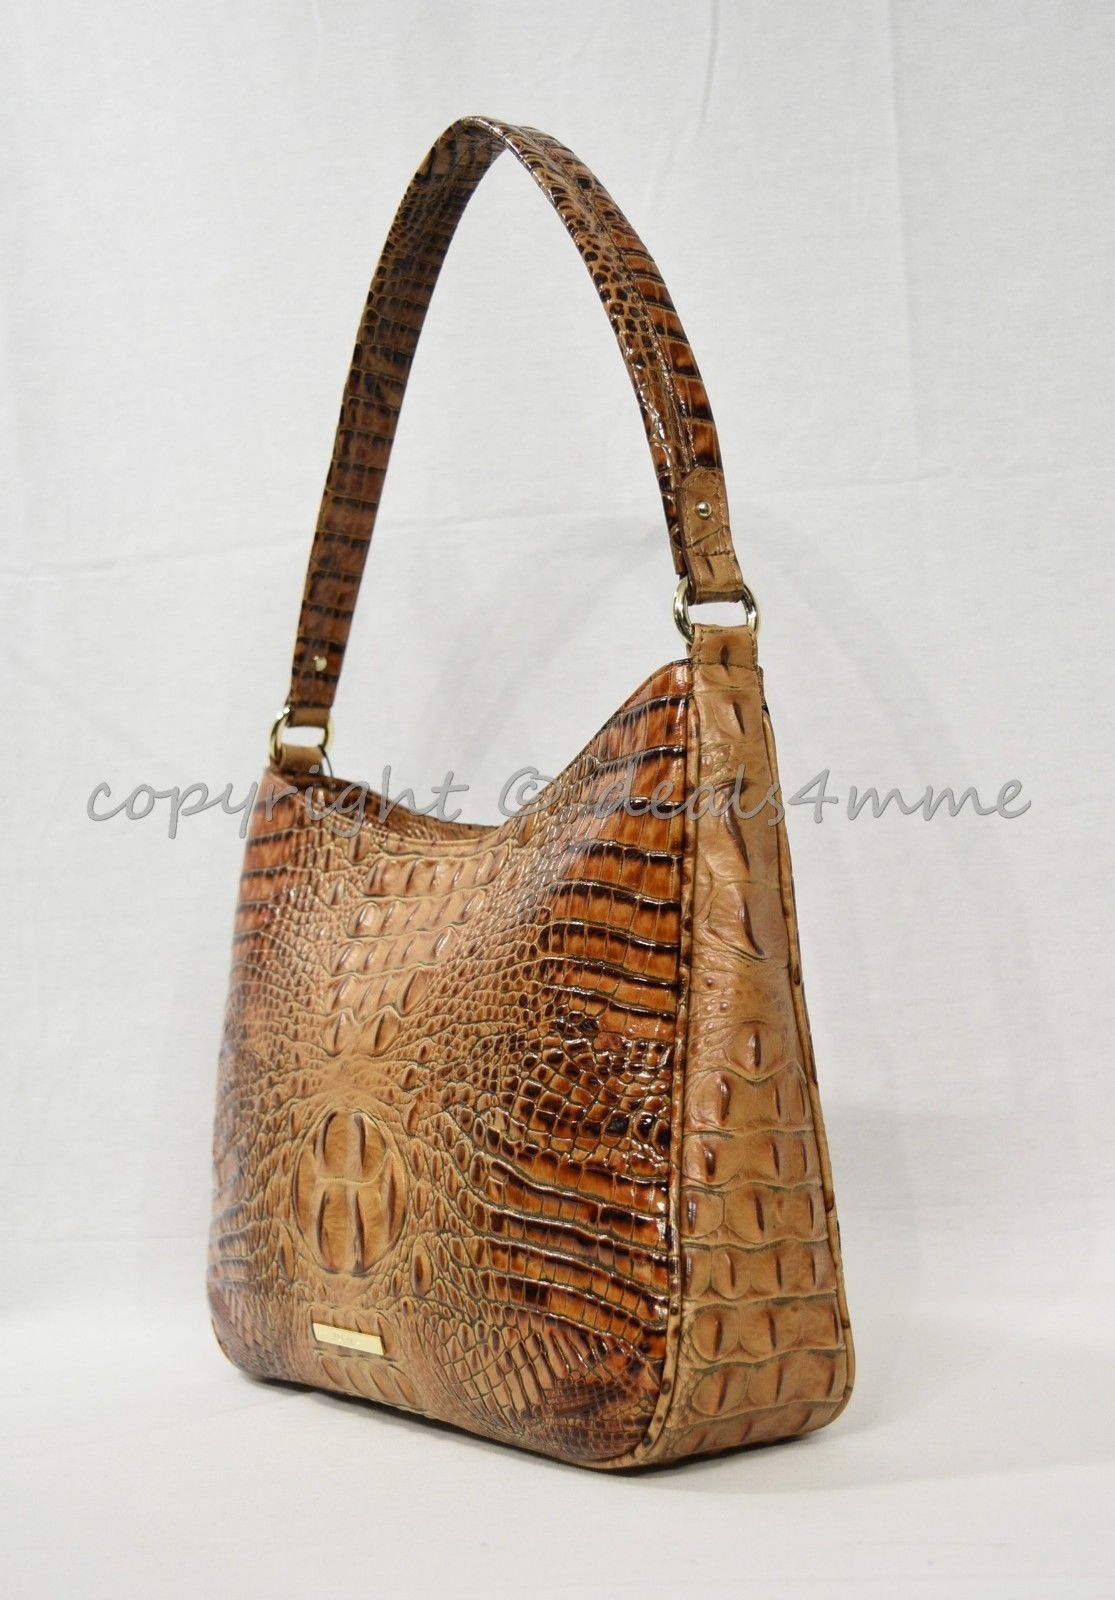 NWT Brahmin Noelle Leather Tote / Shoulder Bag in Toasted Almond Melbourne image 8